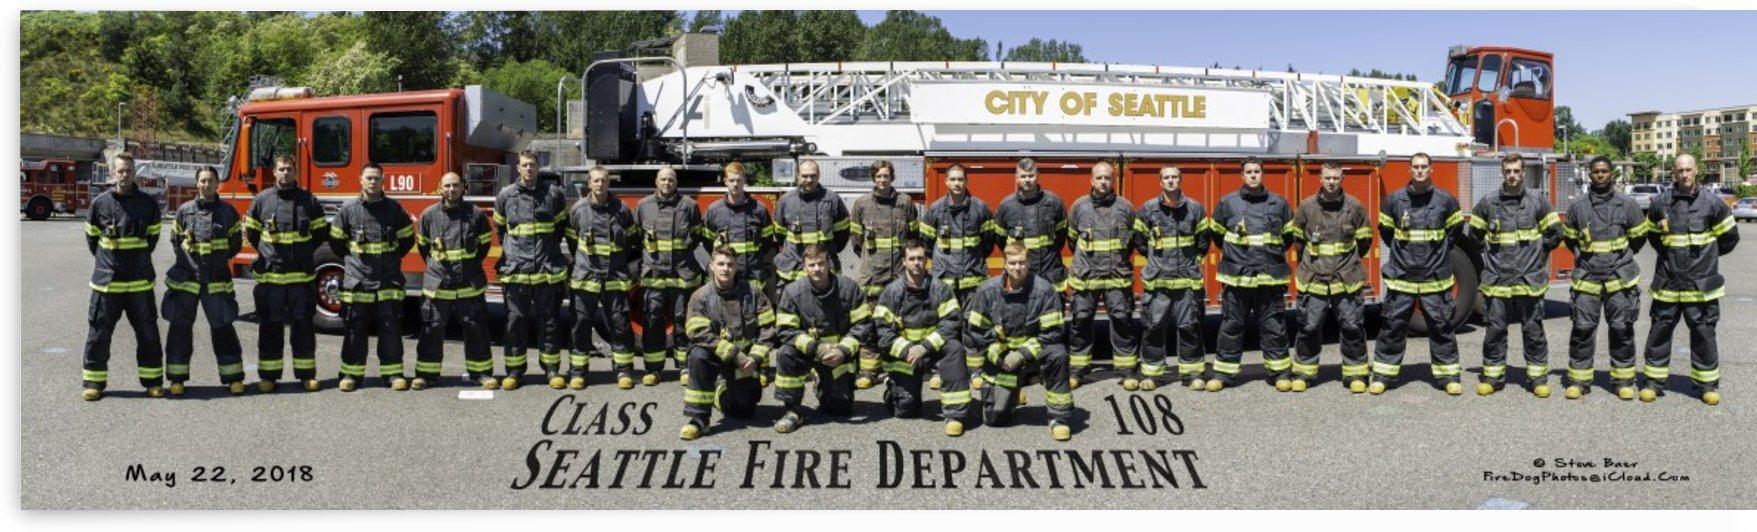 Seattle Fire Recruit Class 108 closed coats by Steve